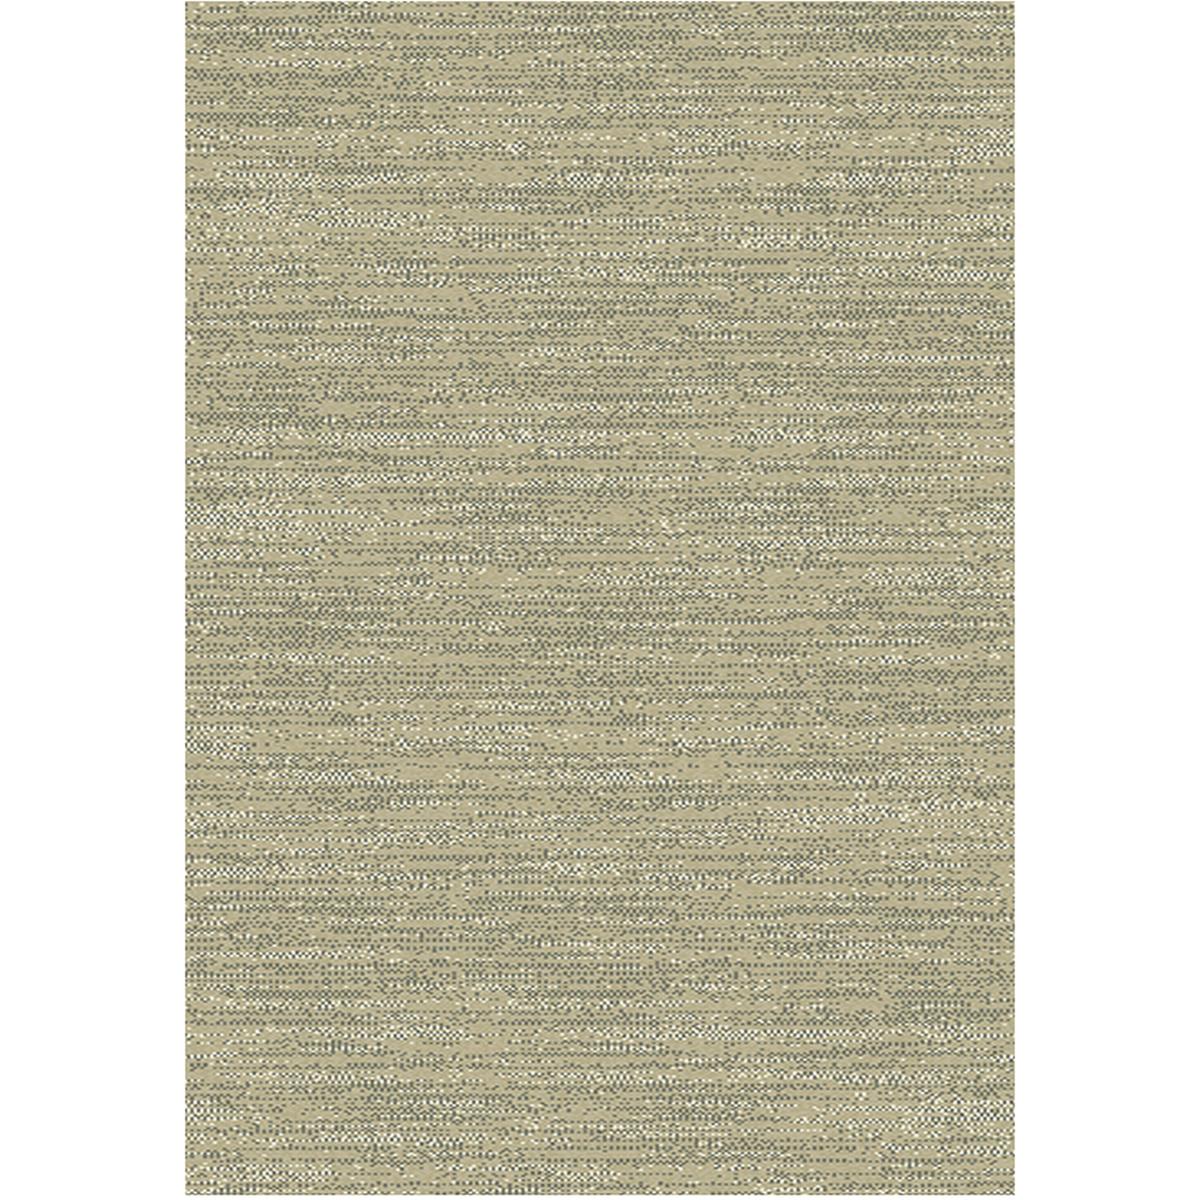 килим Royal Nomad сиви нишки беж 120х170